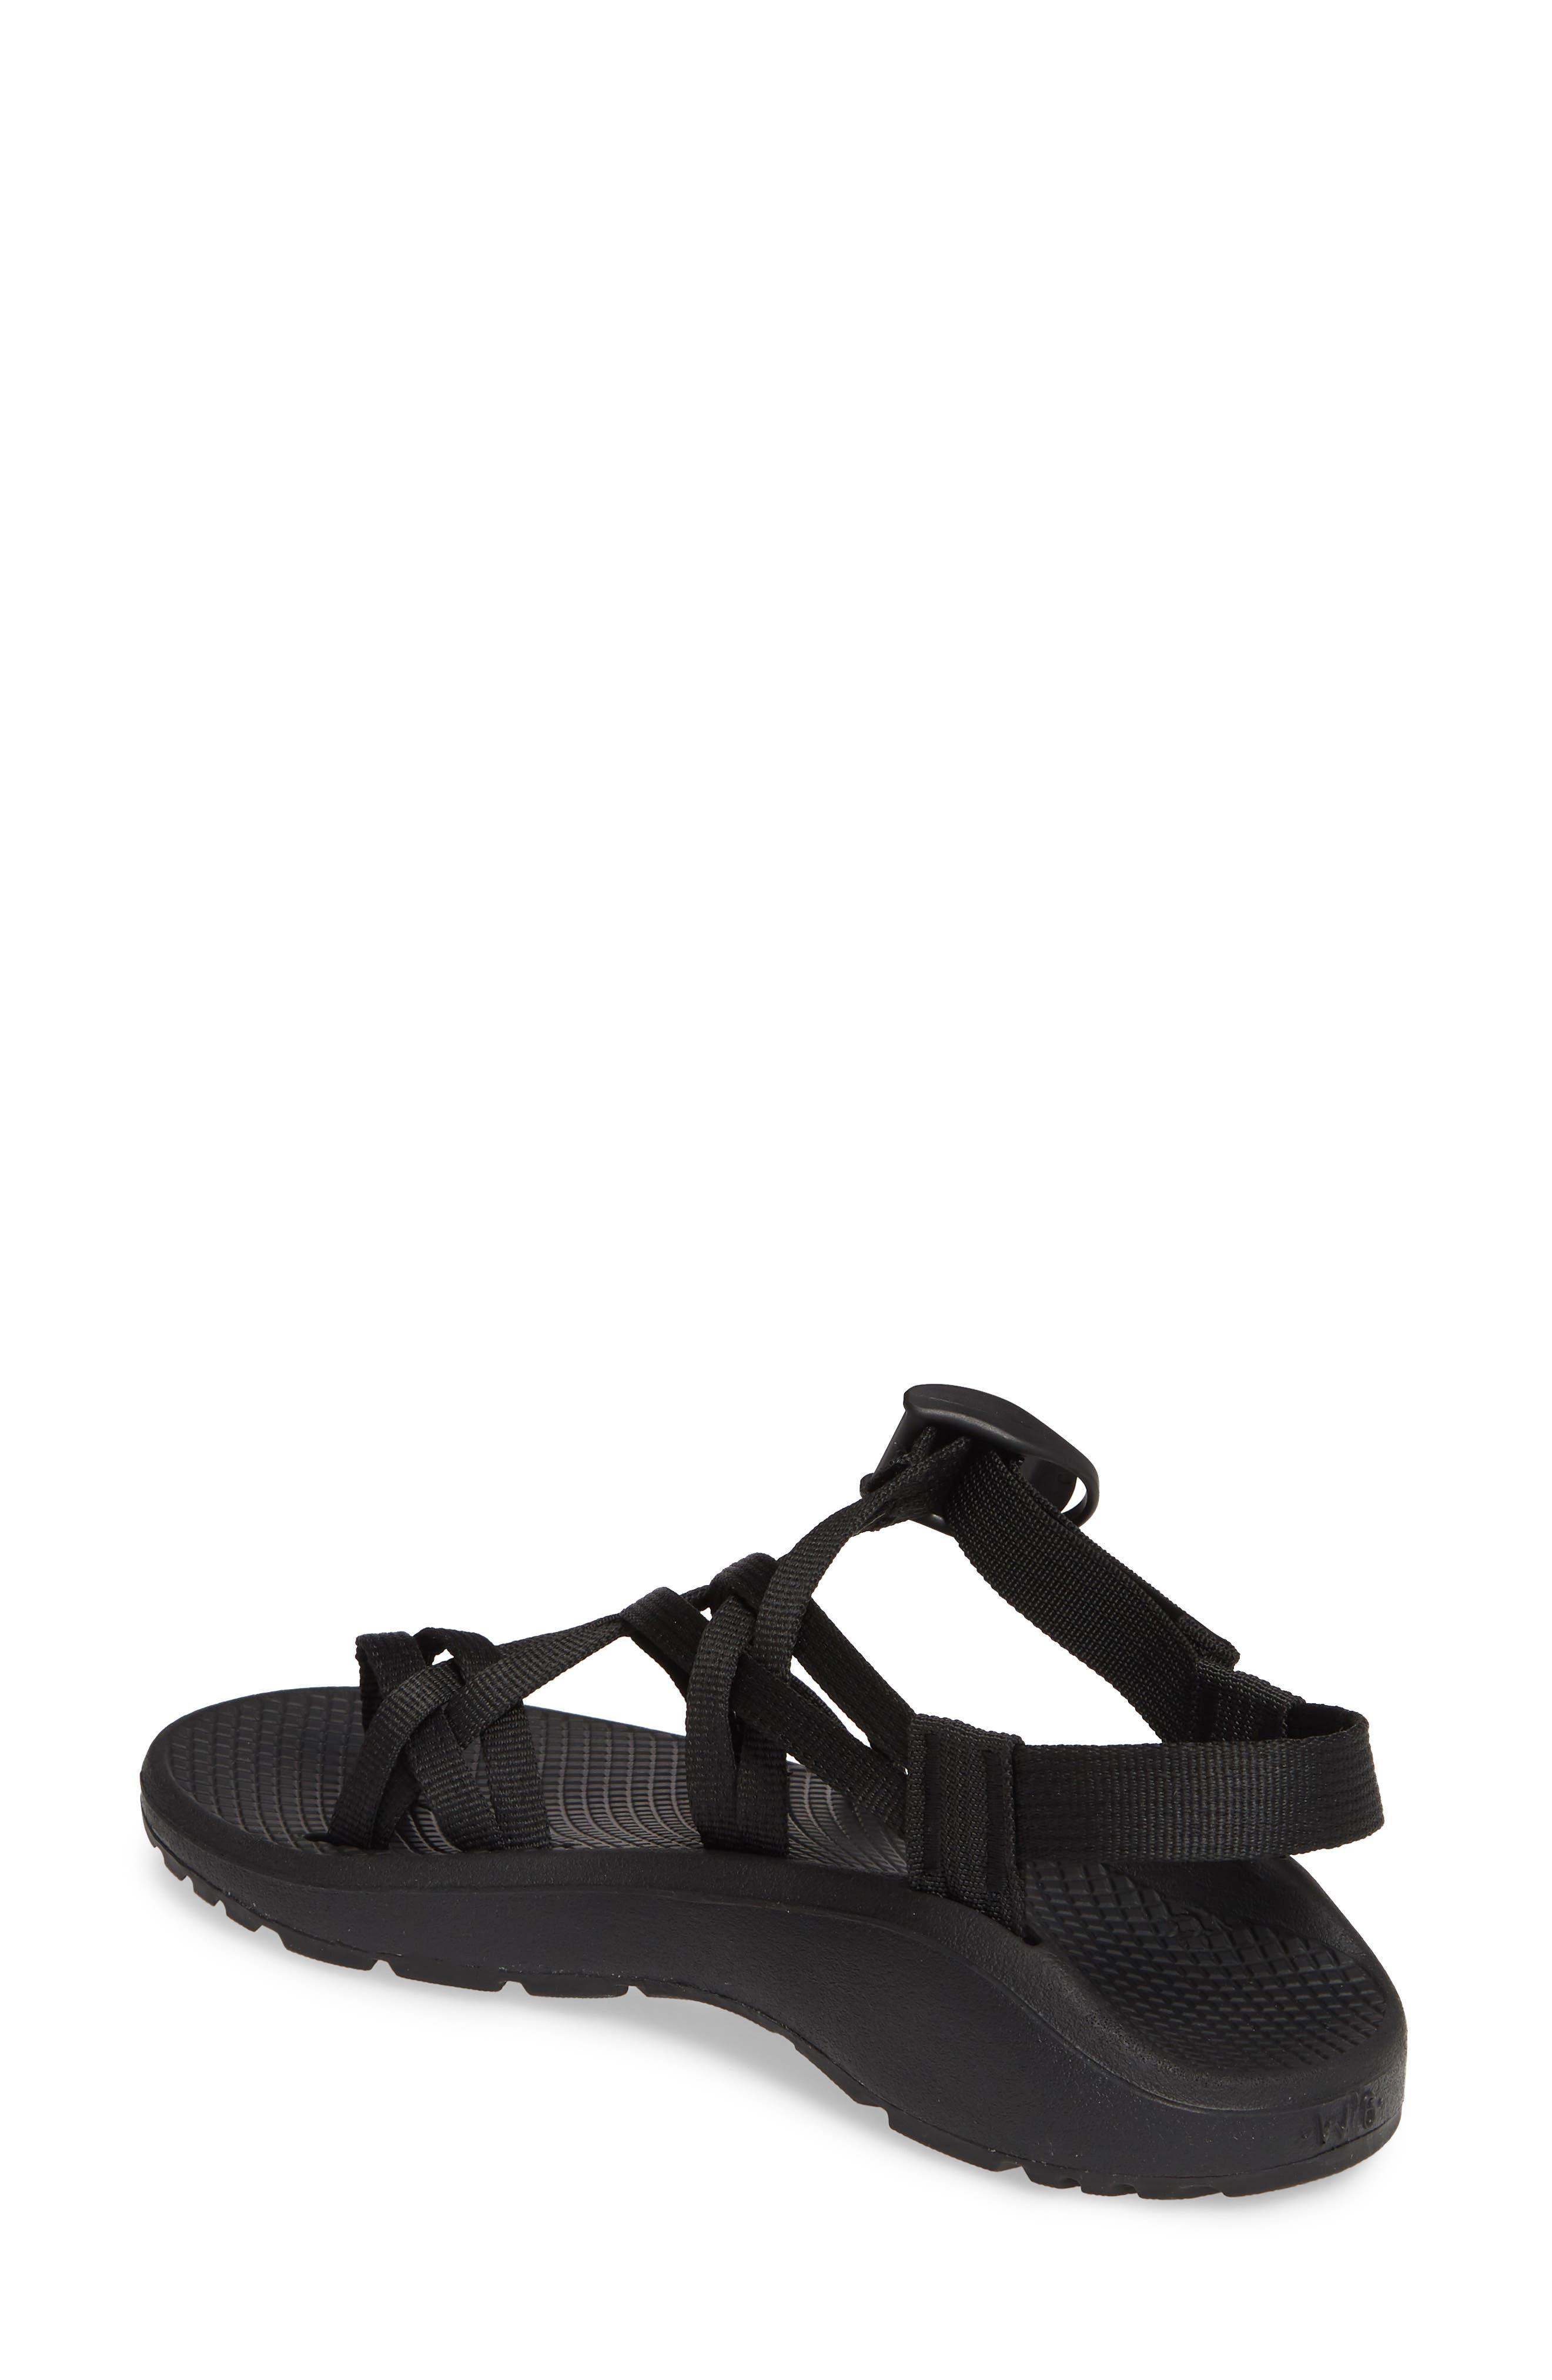 CHACO,                             Z/Cloud X2 Sandal,                             Alternate thumbnail 2, color,                             SOLID BLACK FABRIC